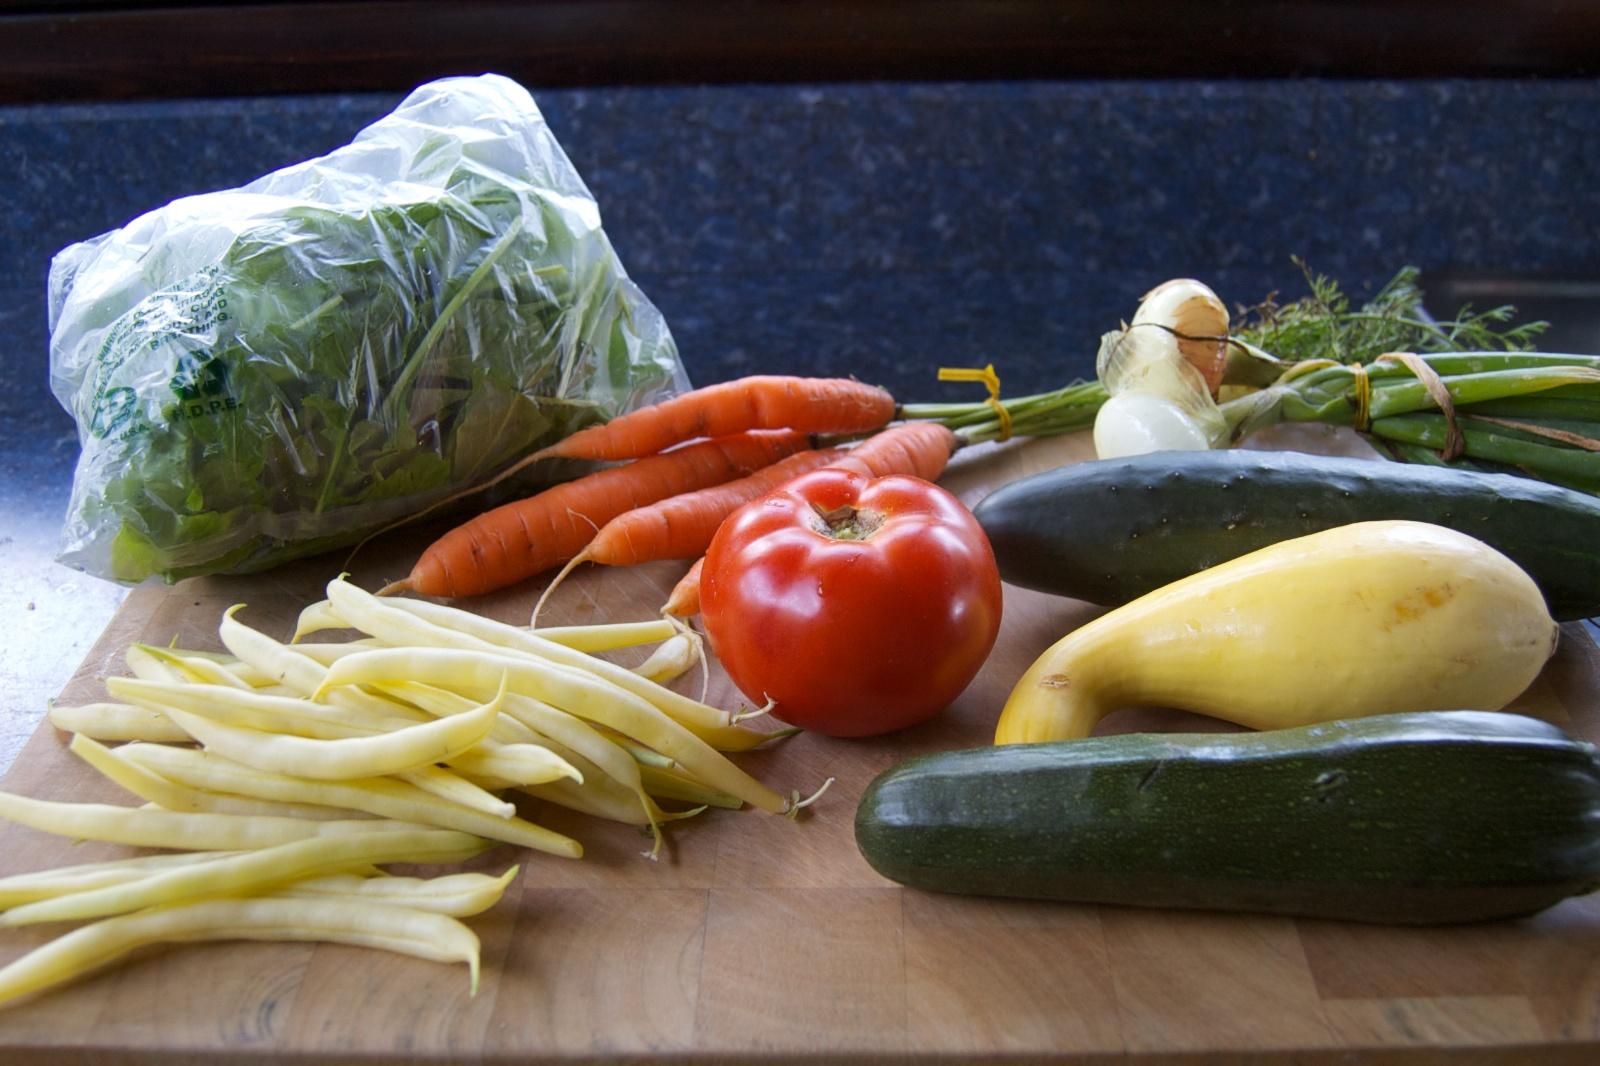 http://blog.rickk.com/food/2014/07/30/csa.2014.08.1.jpg